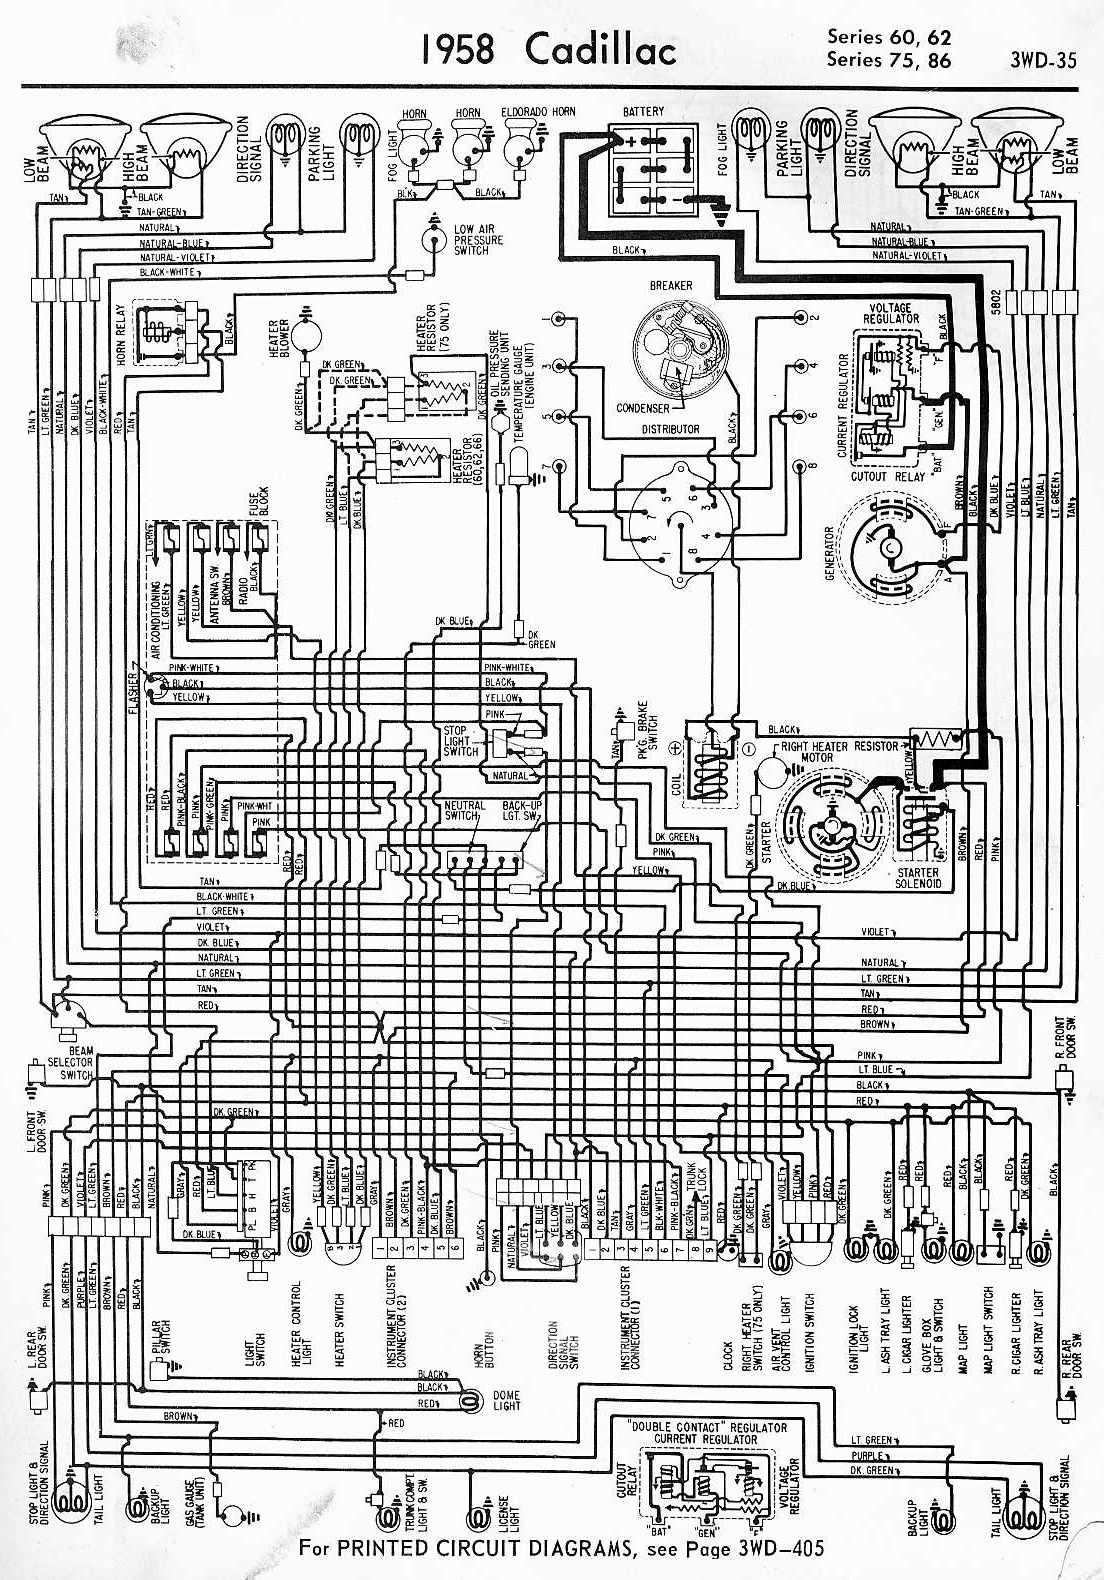 57 Cadillac Eldorado Wiring Diagram 67 Firebird 51 1957 Trusted Schematics On